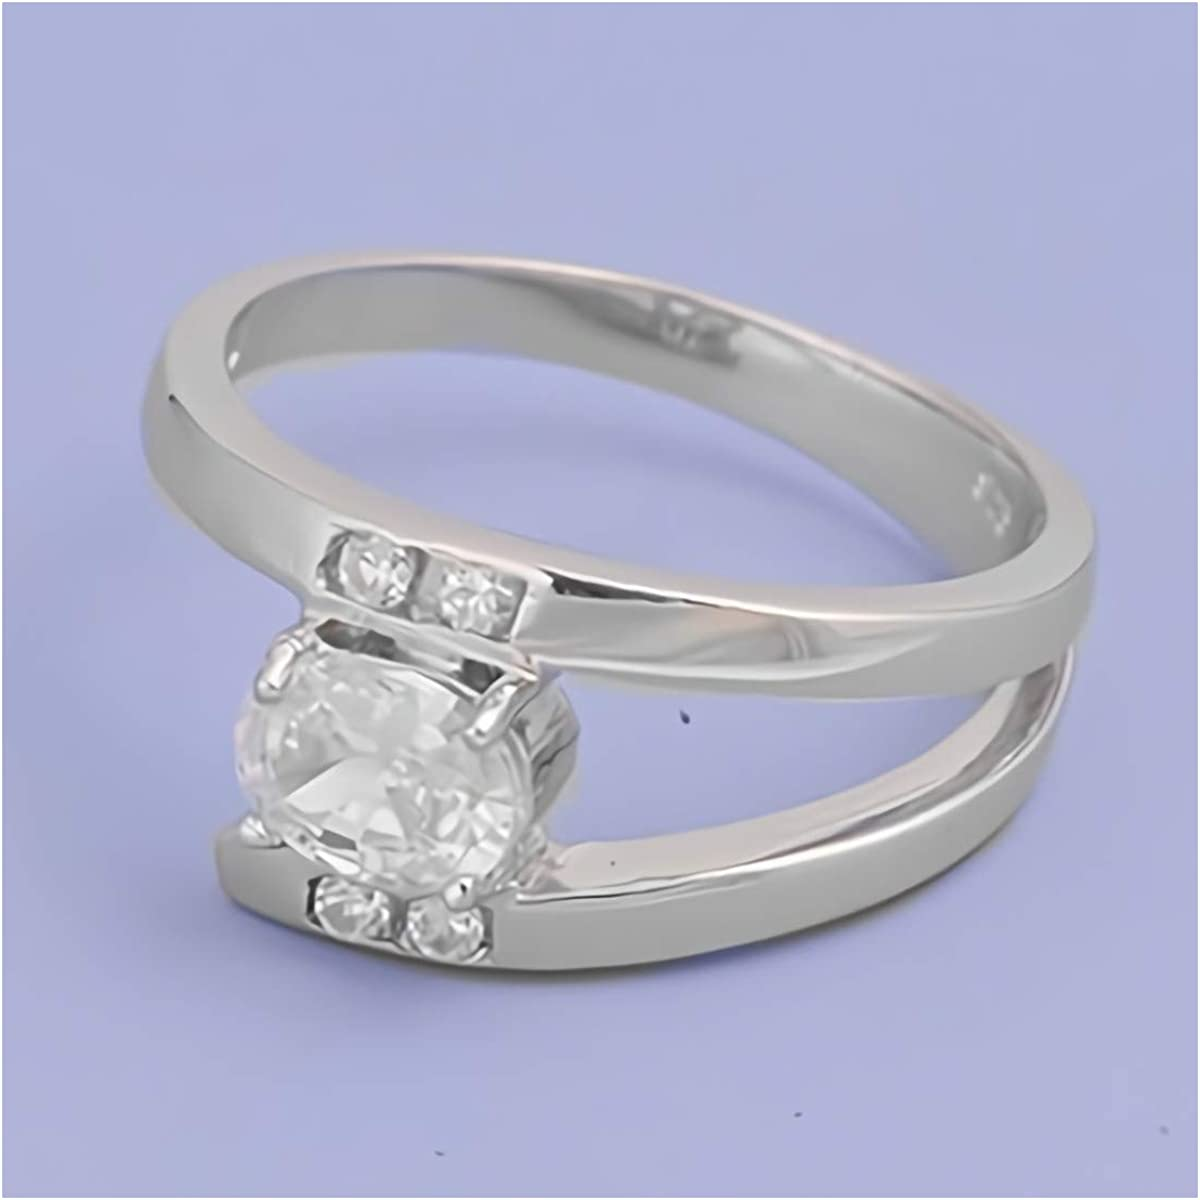 Glitzs Jewels 925 Sterling Silver CZ Ring | Cubic Zirconia Jewelry Gift